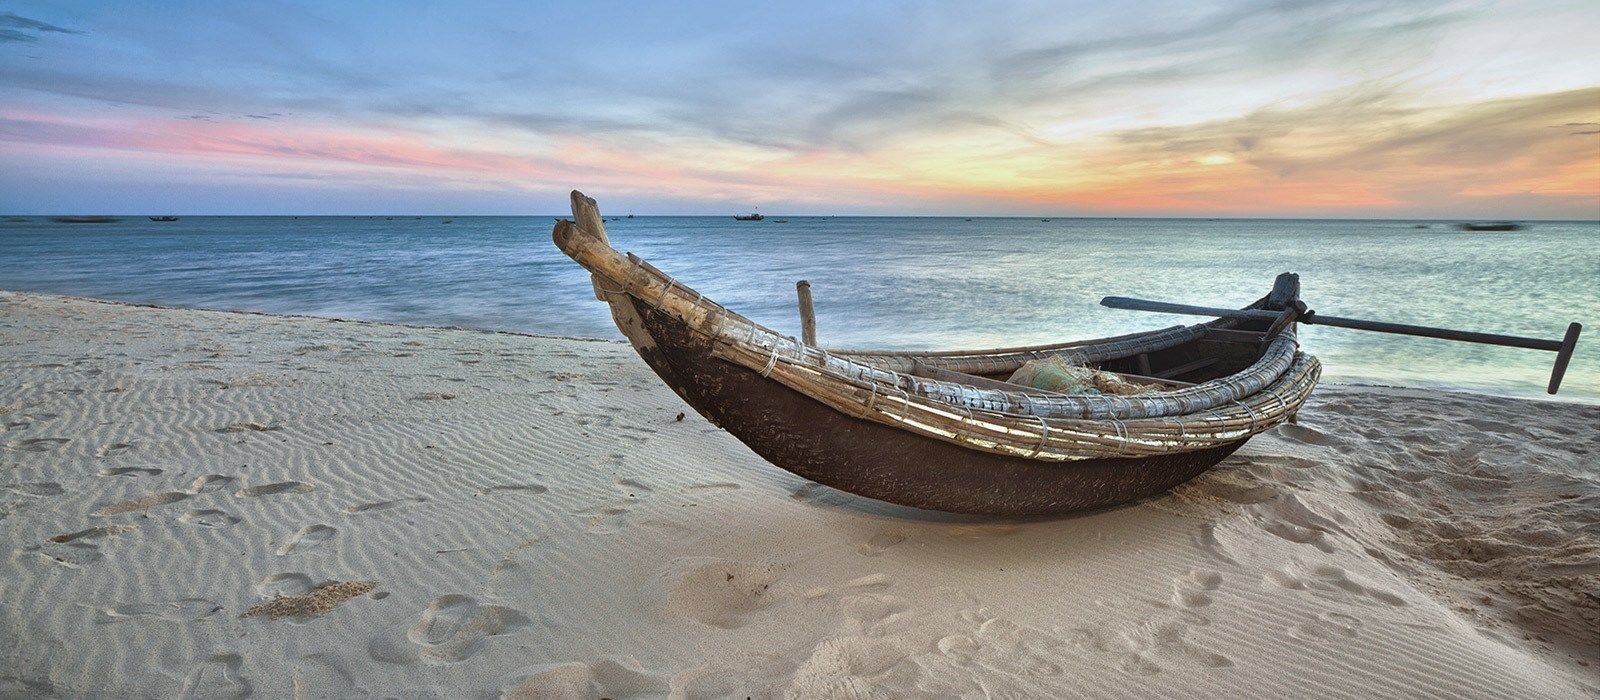 A Grand Journey through South East Asia Tour Trip 5